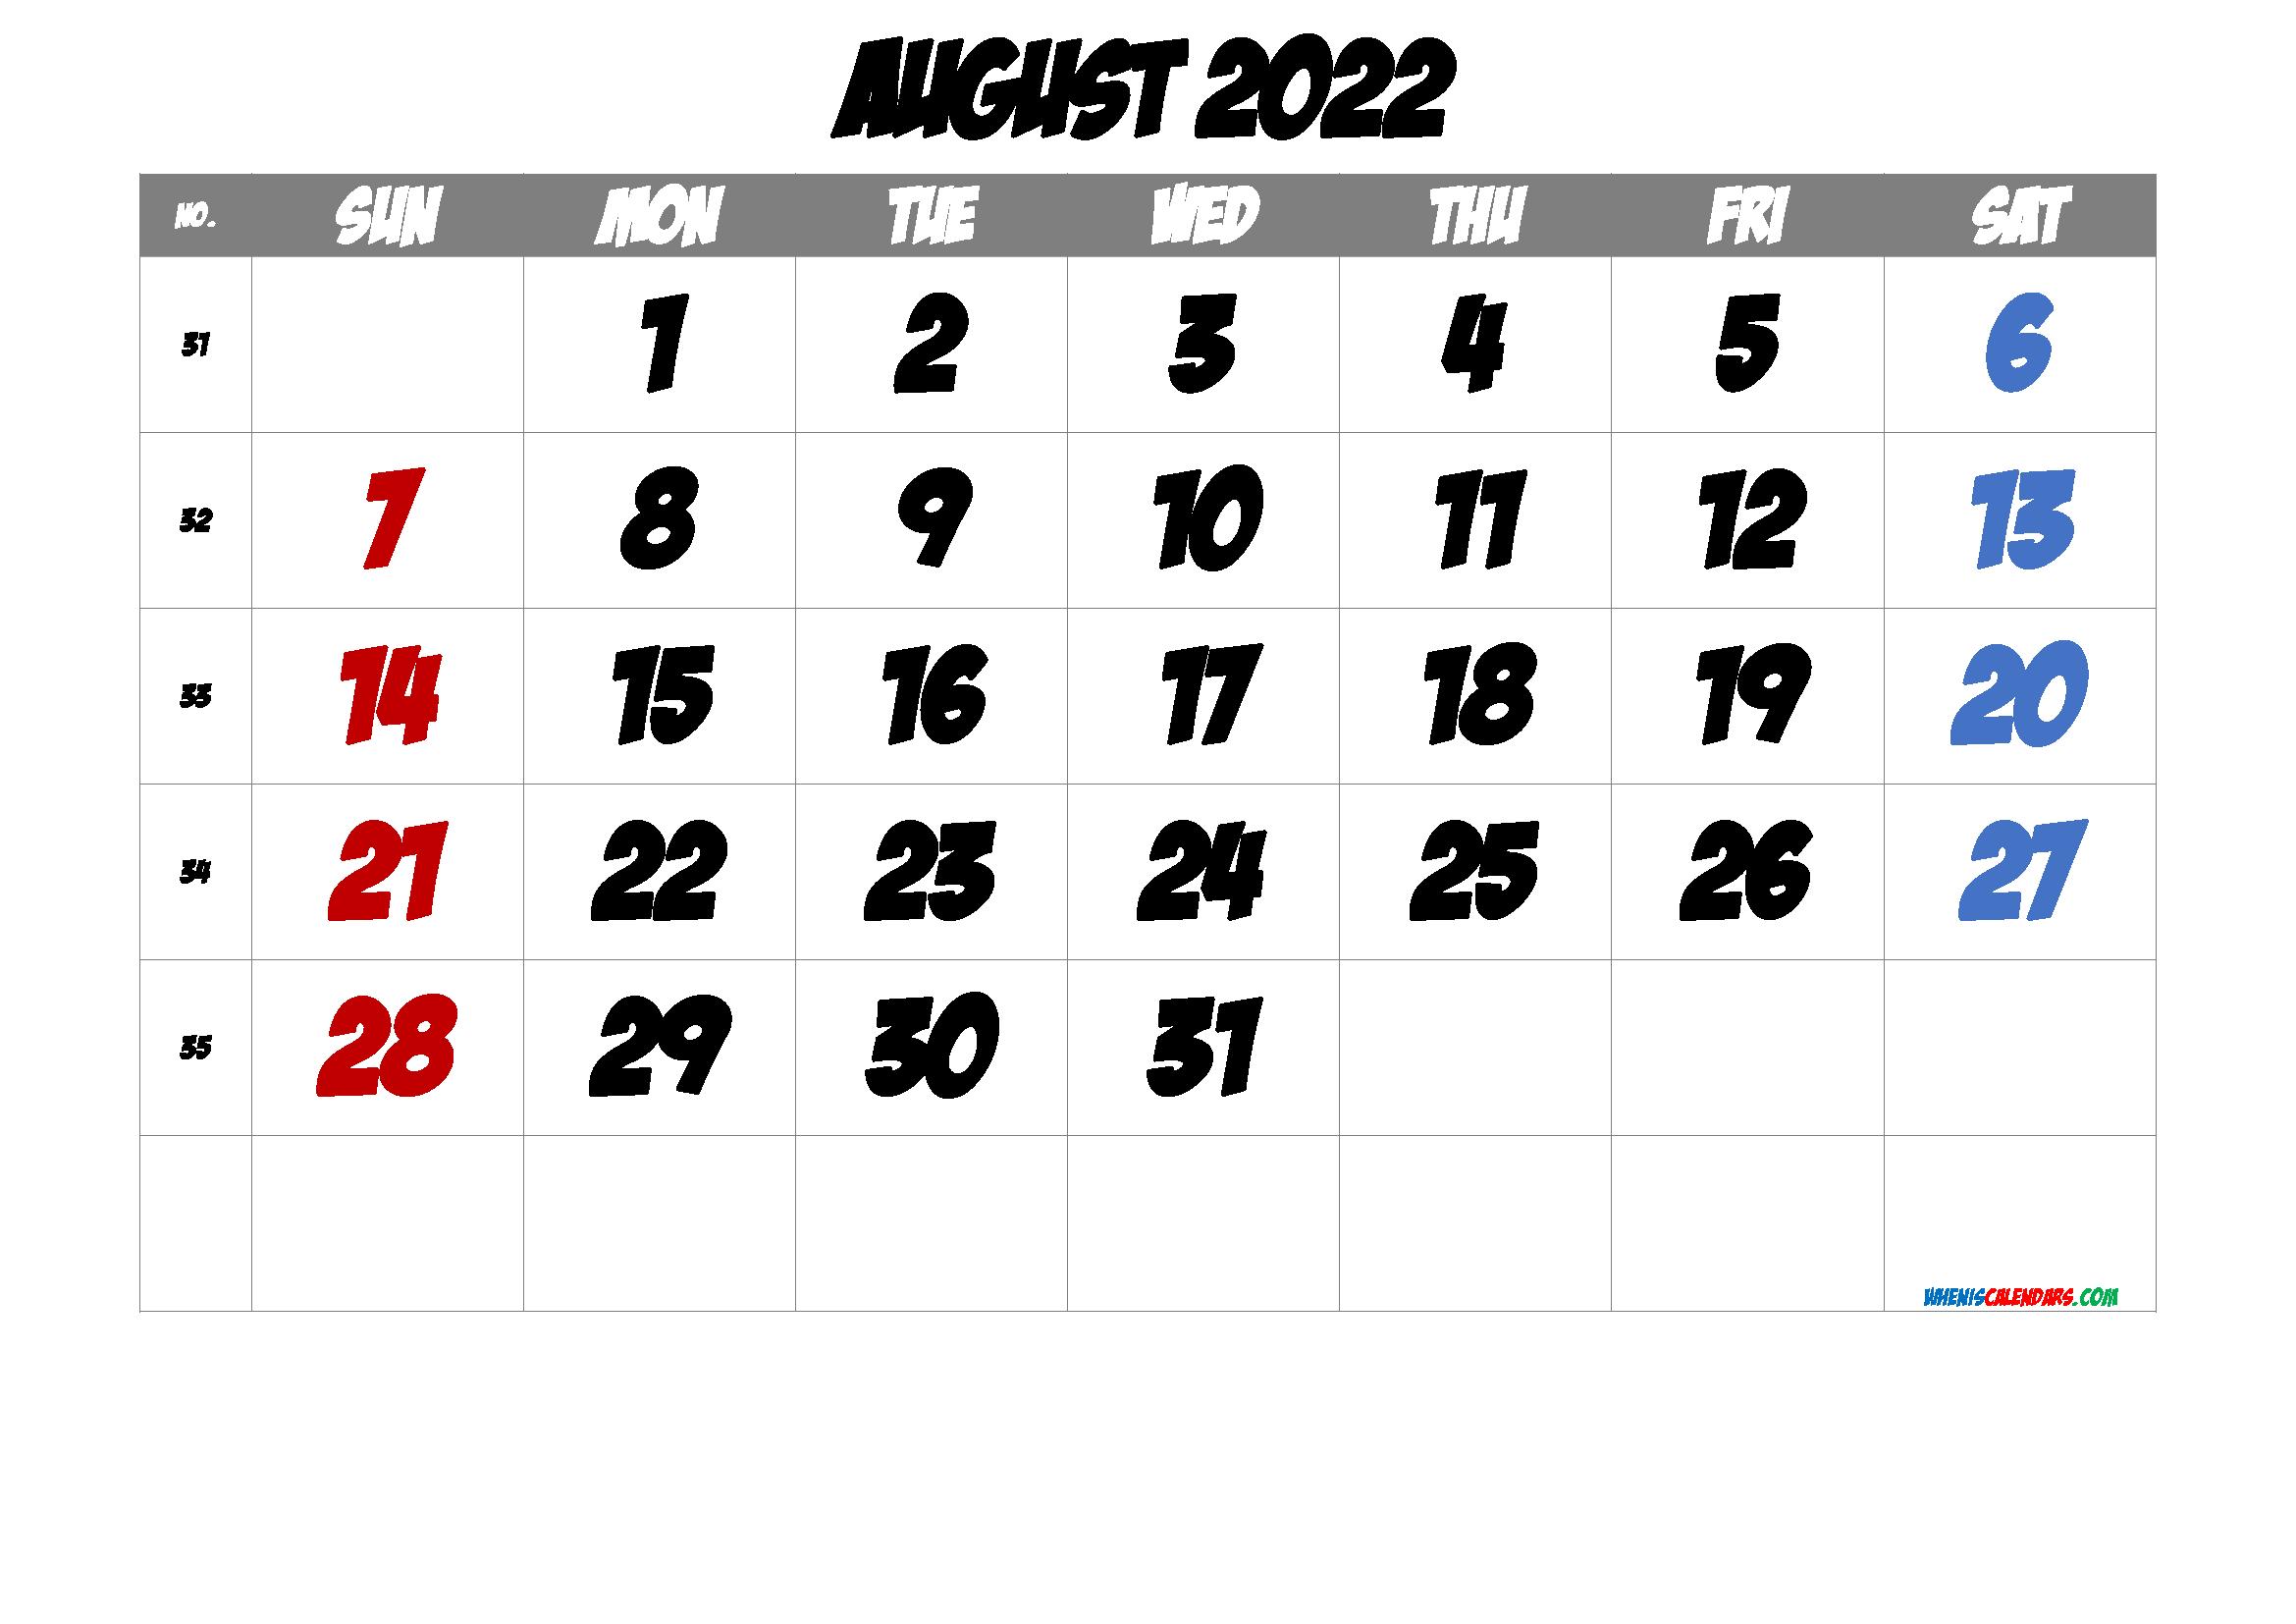 2022 August Free Printable Calendar